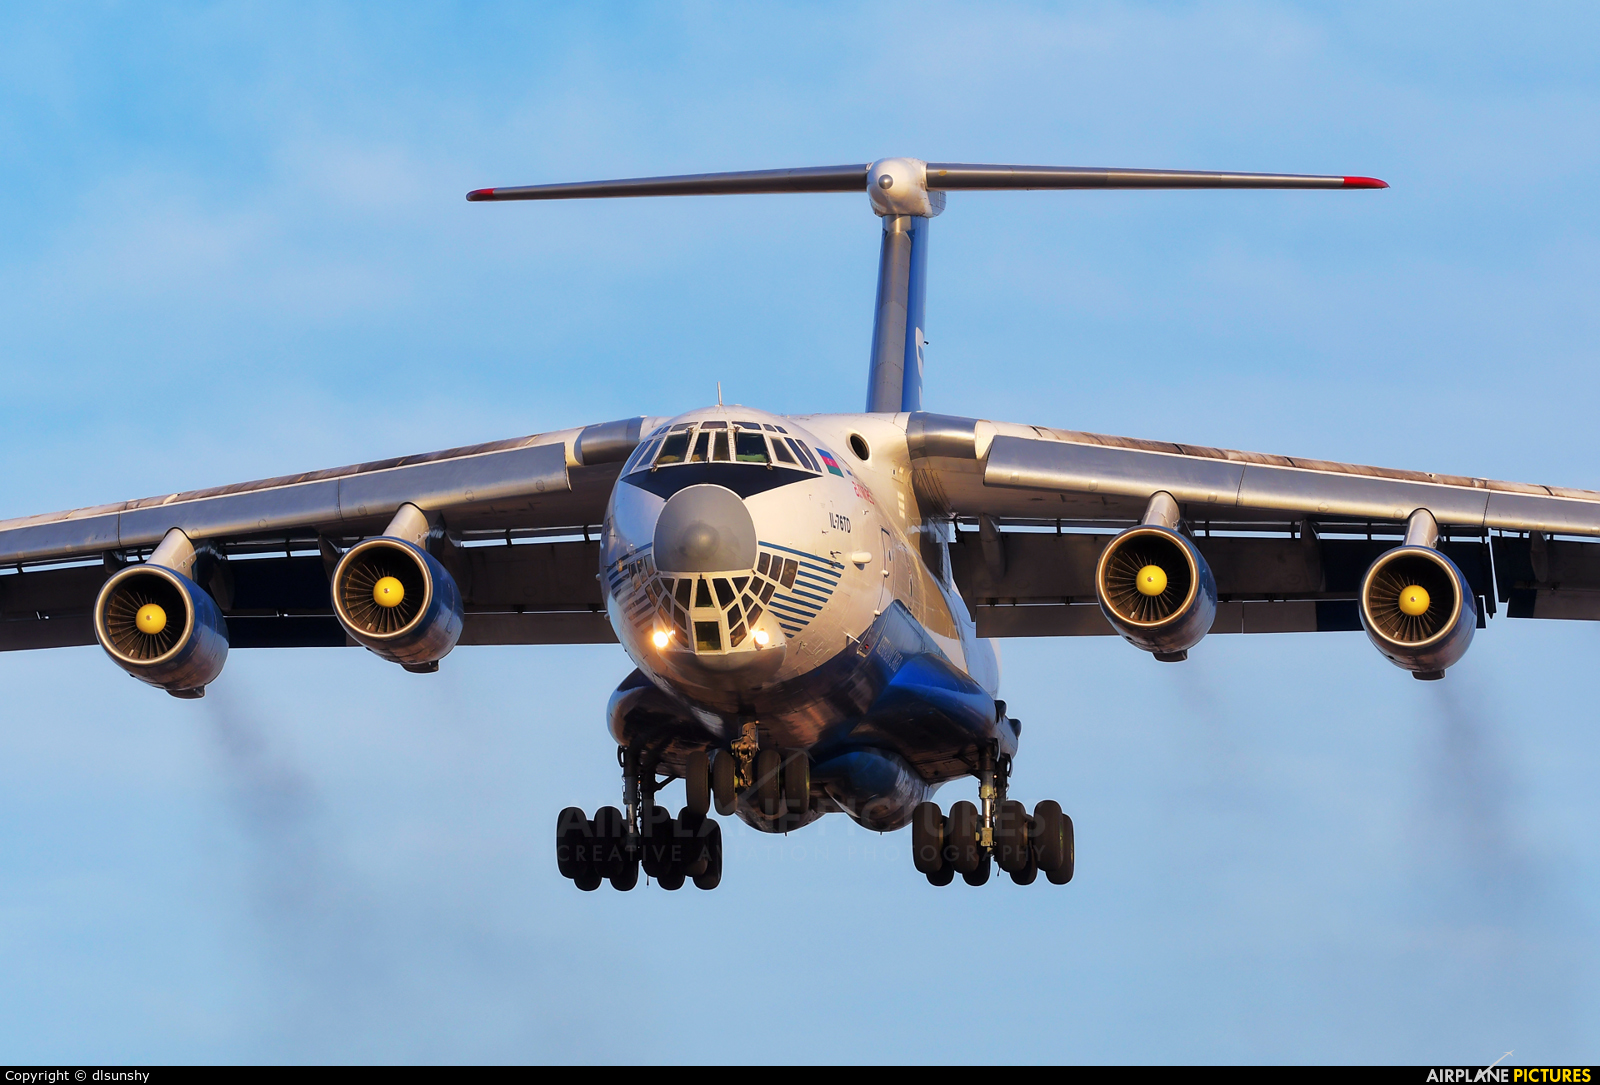 Silk Way Airlines 4K-AZ40 aircraft at Dalian Zhoushuizi Int'l